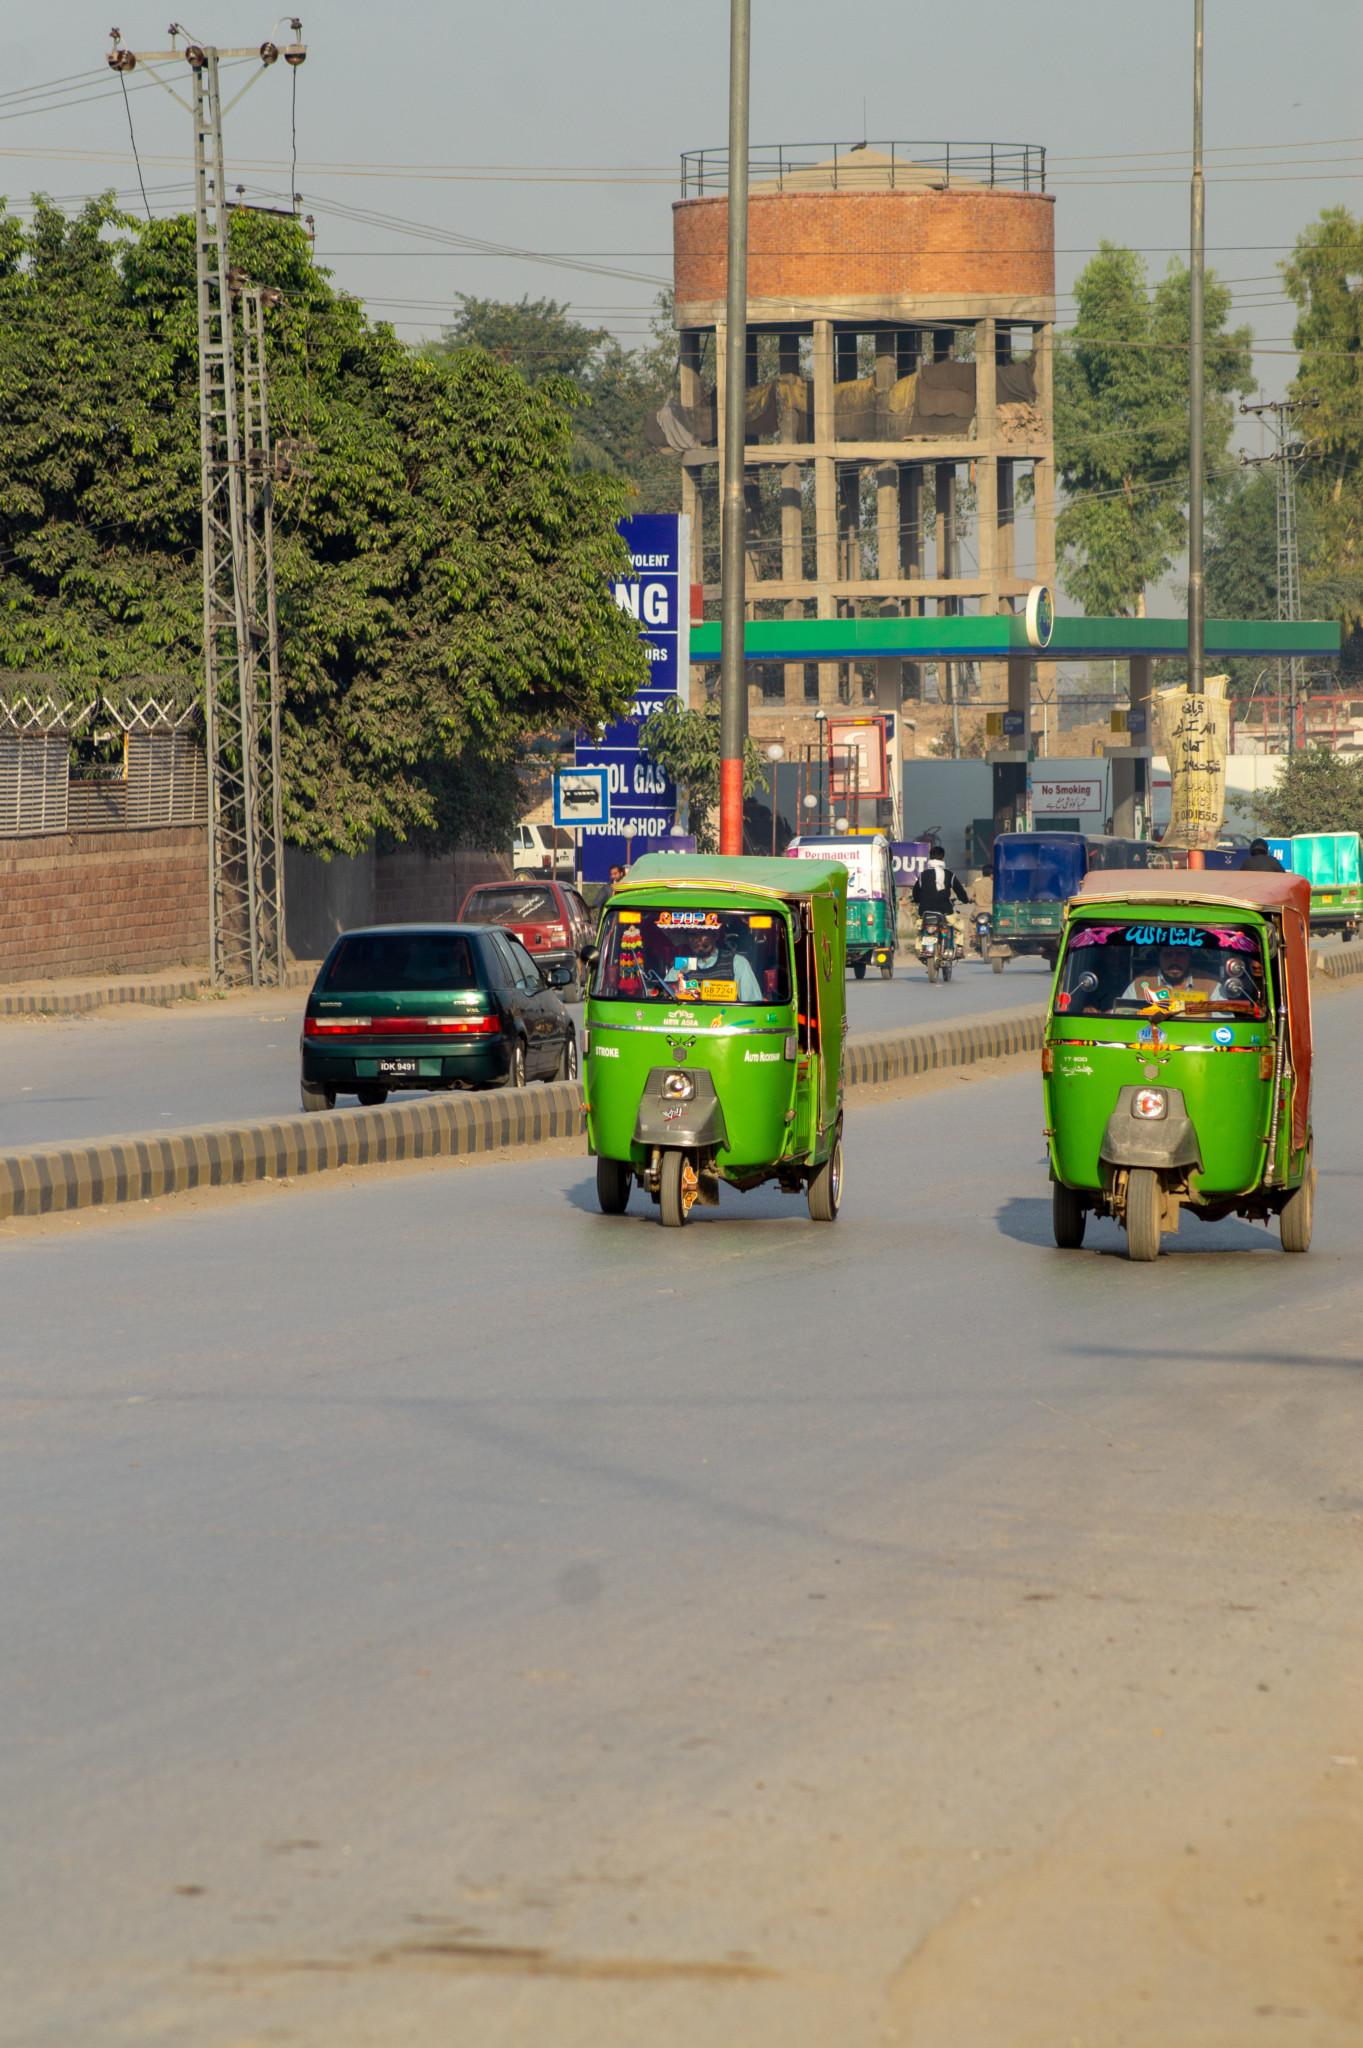 Rikscha als Fortbewegungsmittel in Pakistan